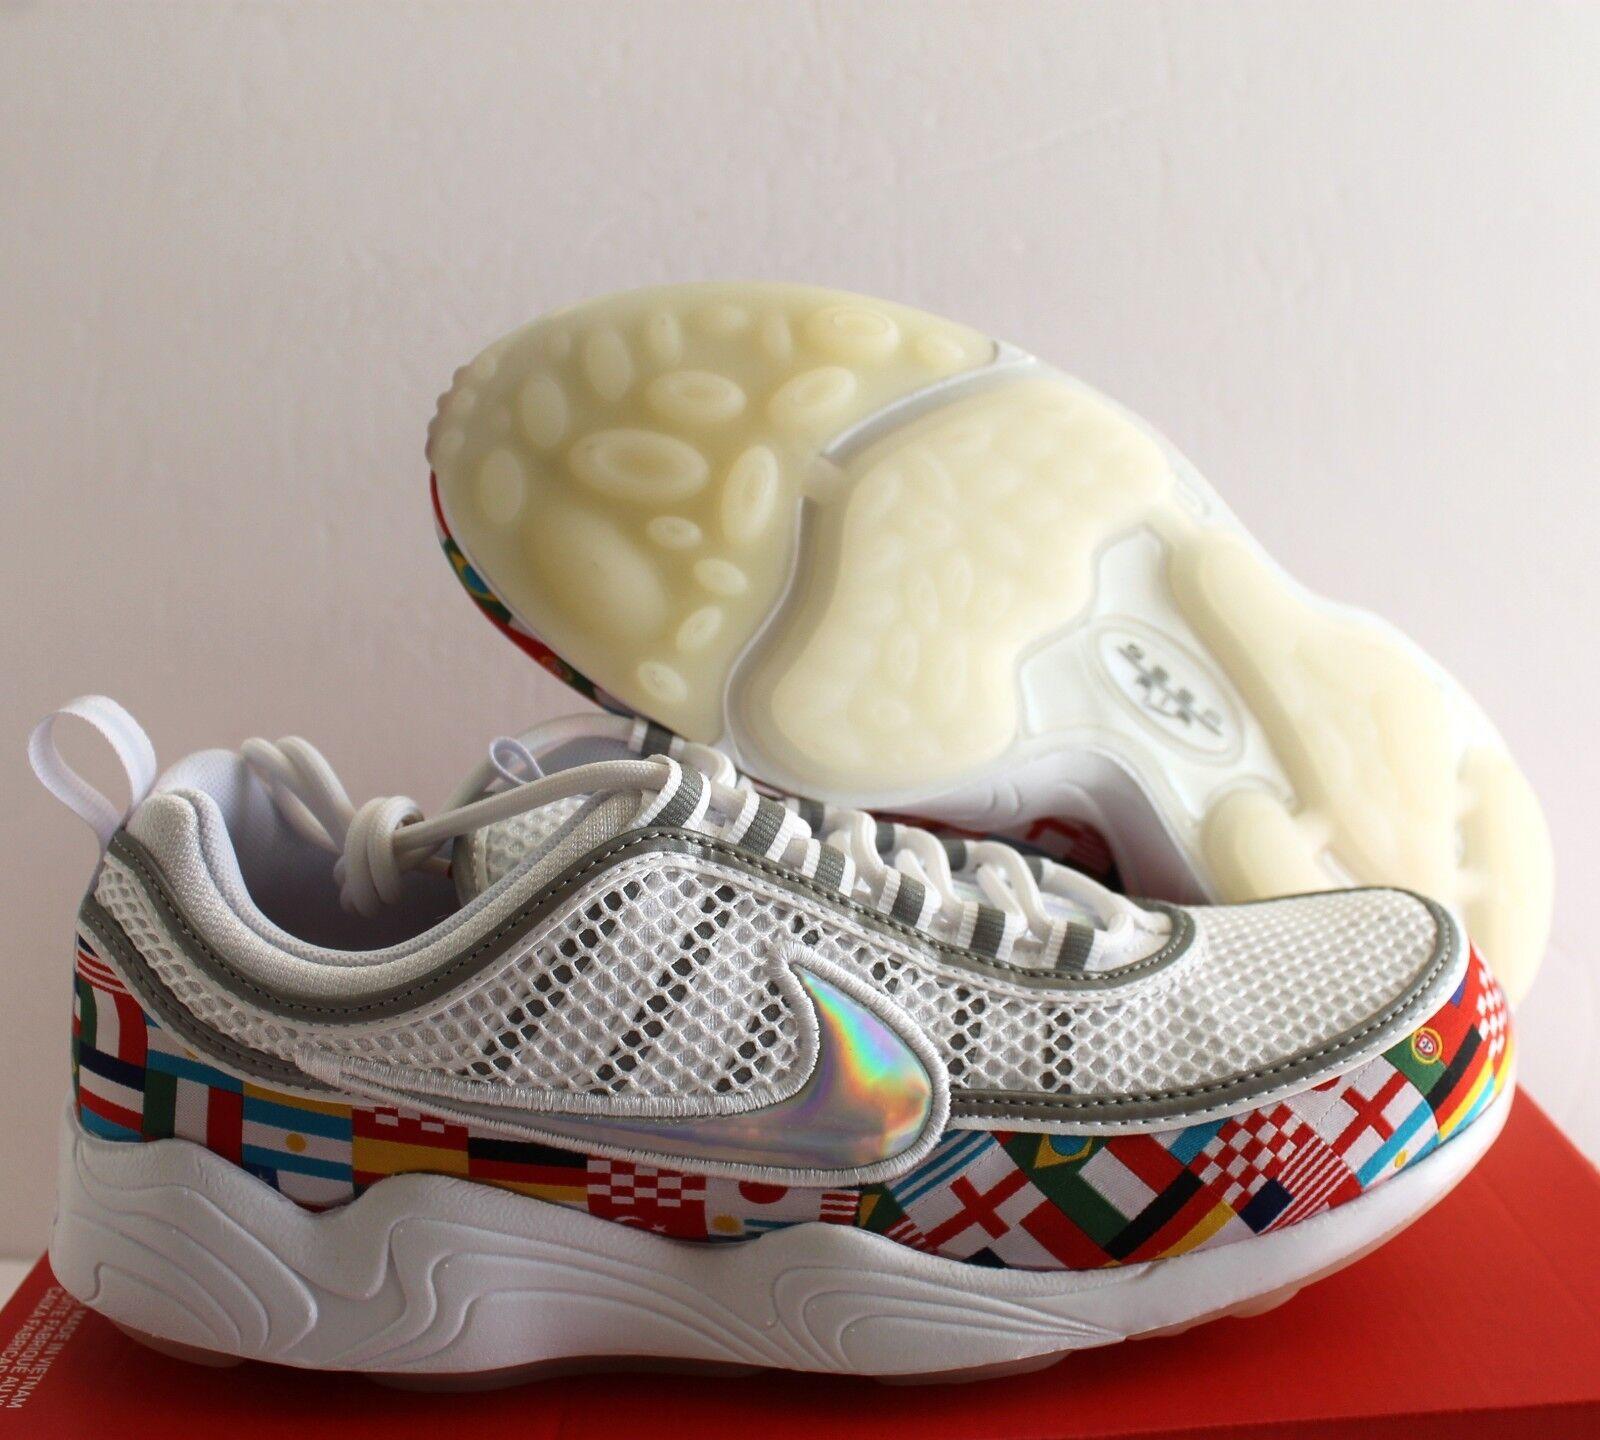 Nike Air Zoom Spiridon 16 NIC World Cup International Flag SZ 8.5